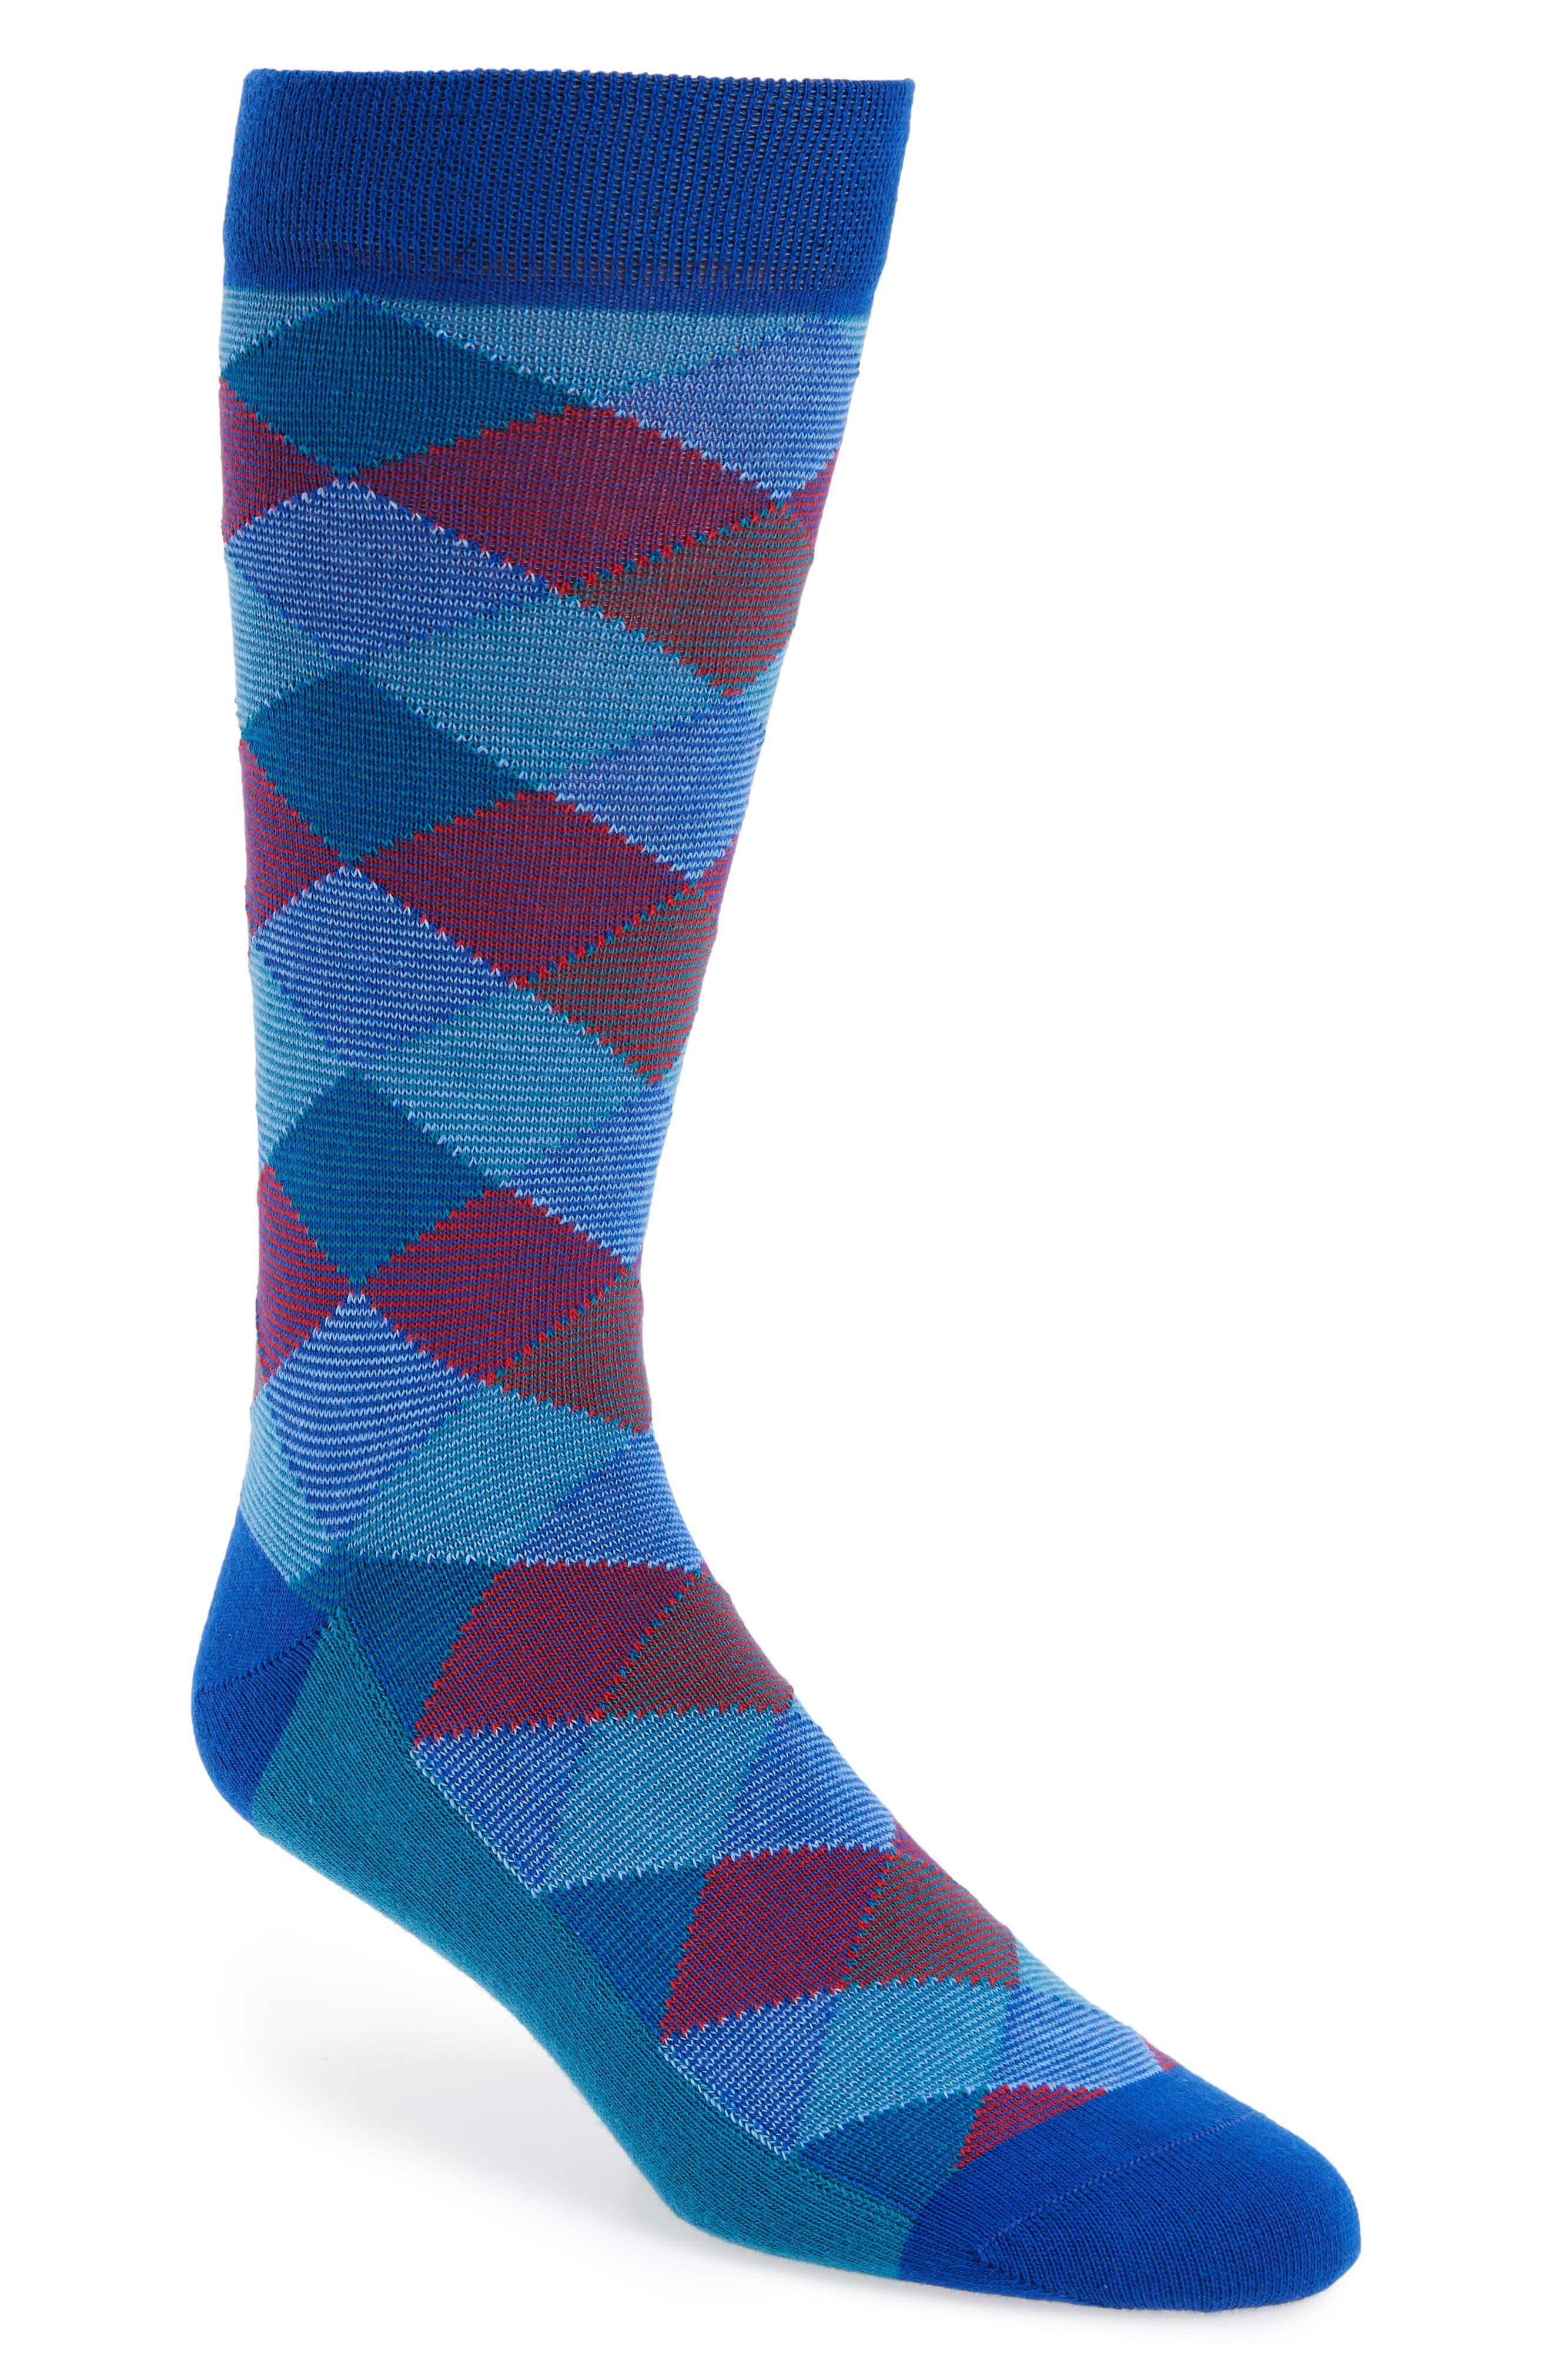 Shiftie Argyle Socks,                         Main,                         color, 421